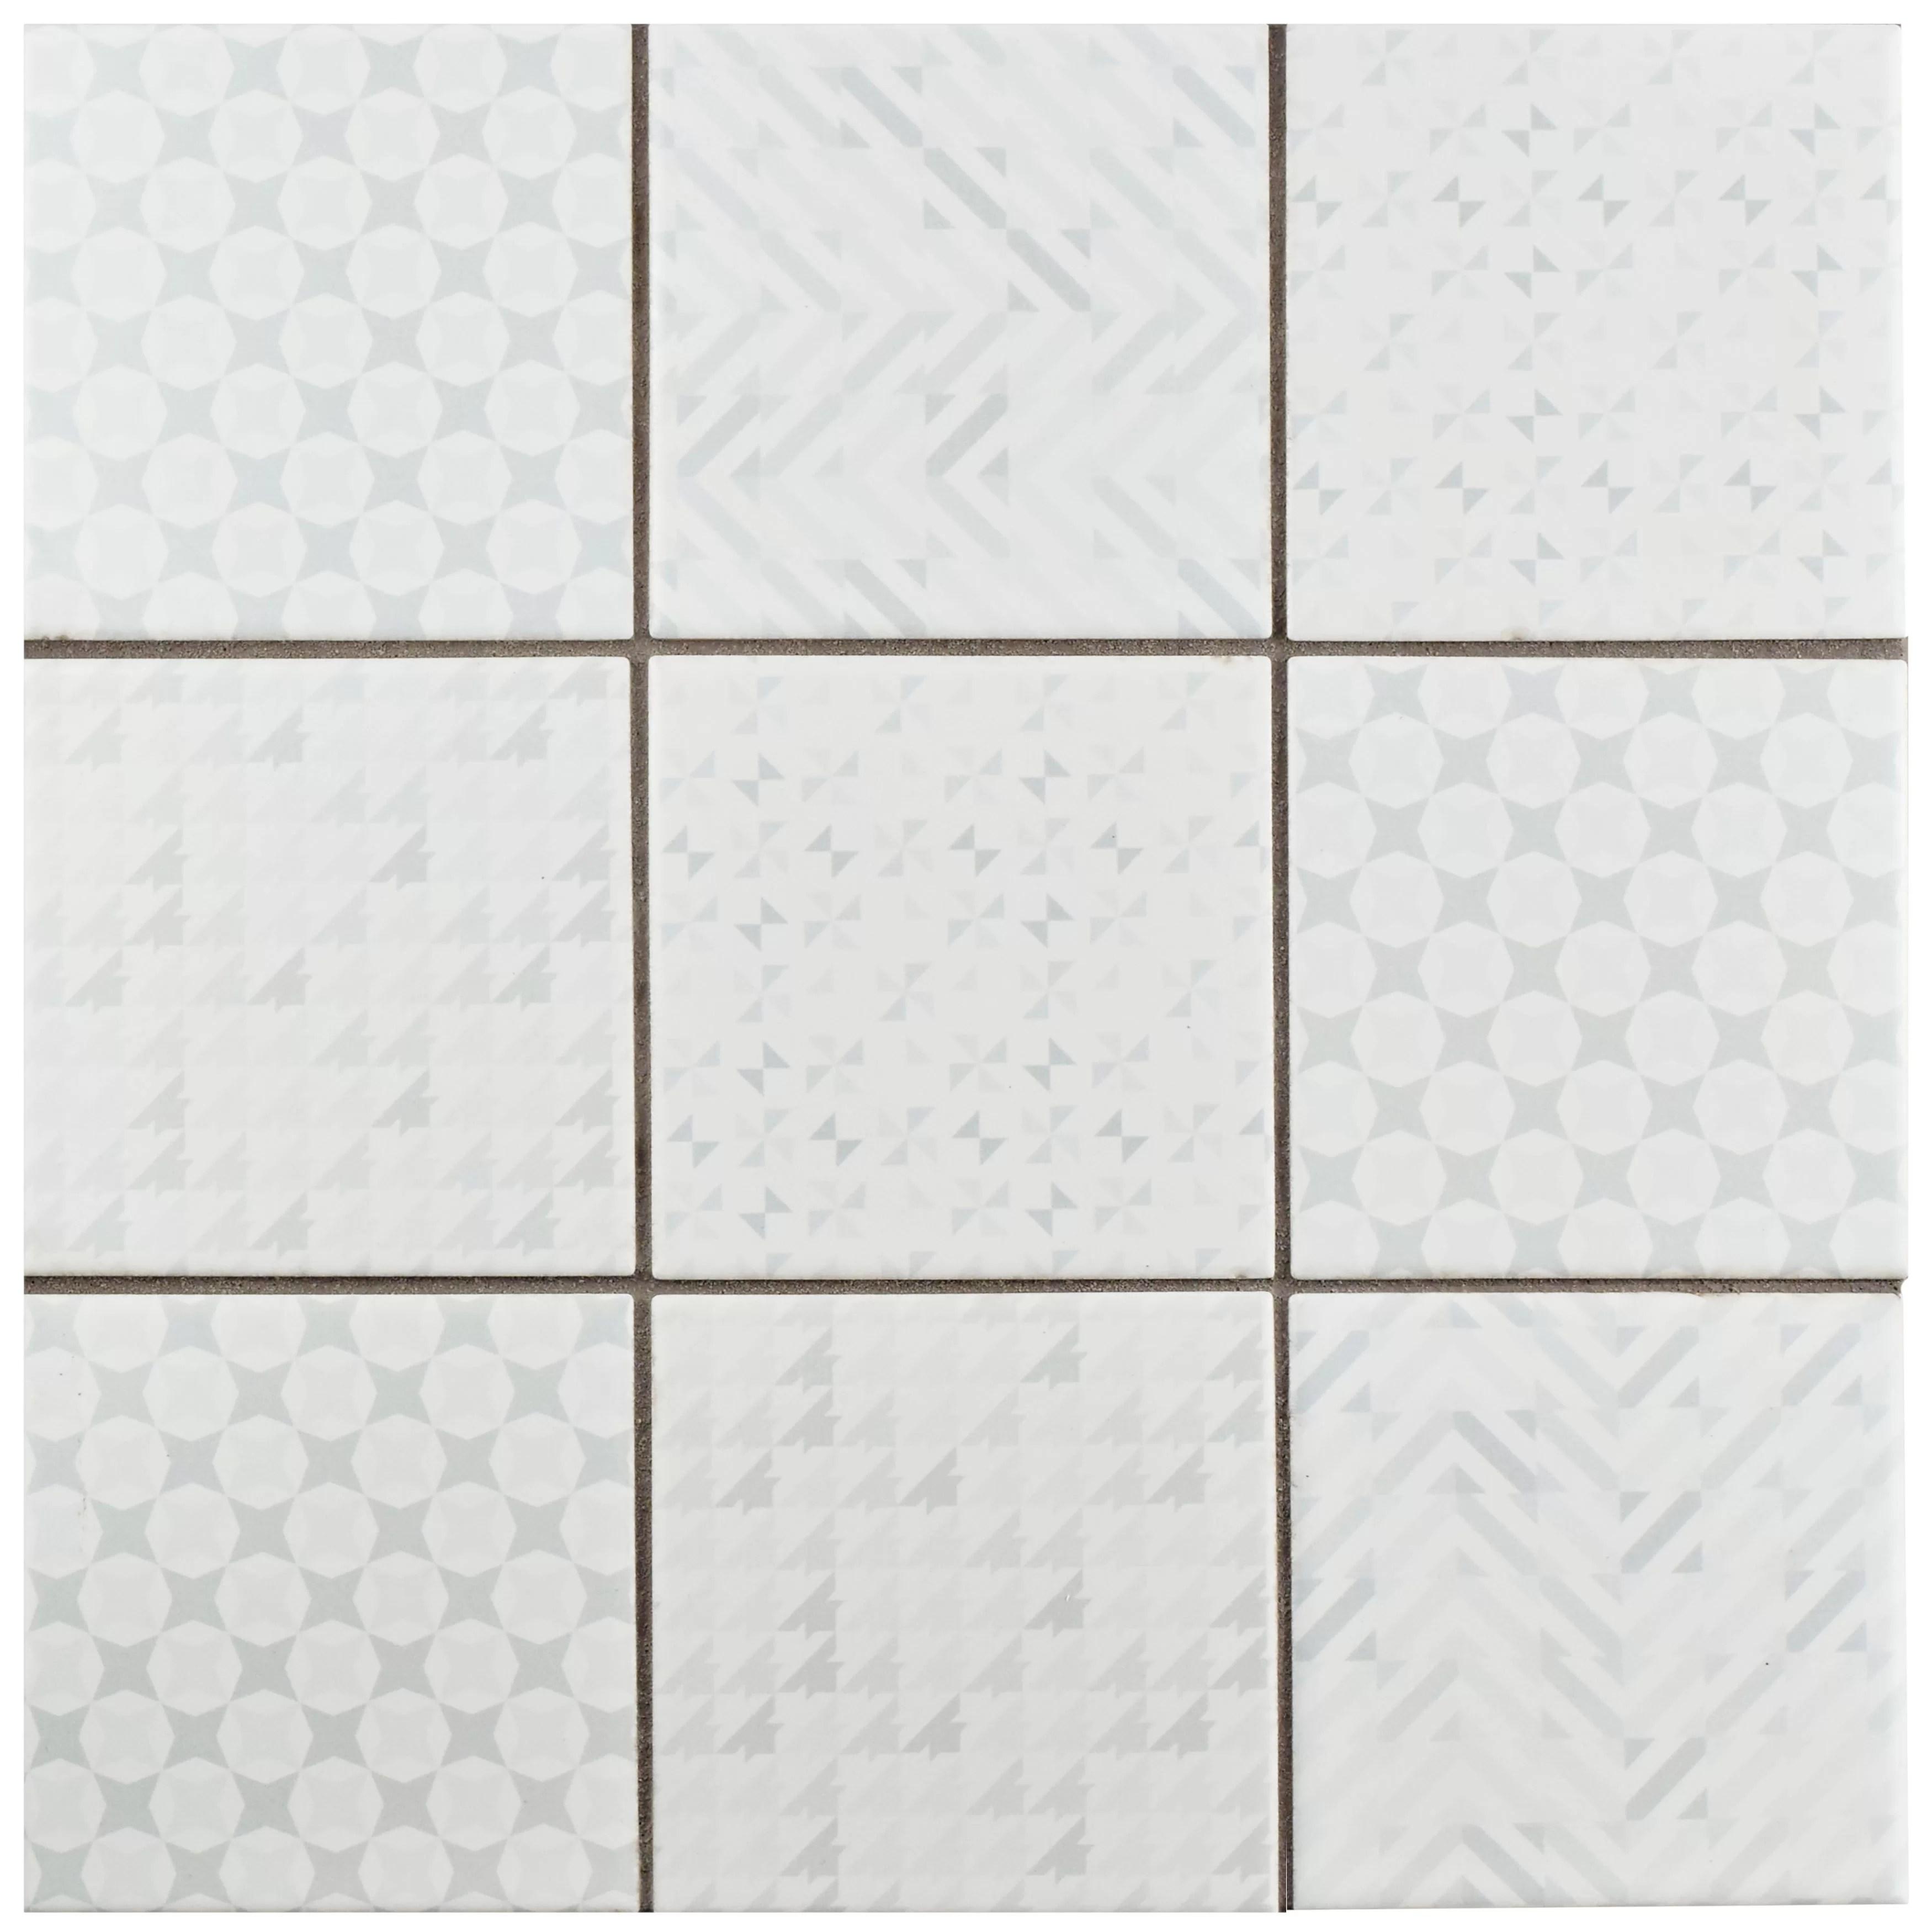 Elitetile Geogloss 3 88 X 3 88 Porcelain Mosaic Tile In